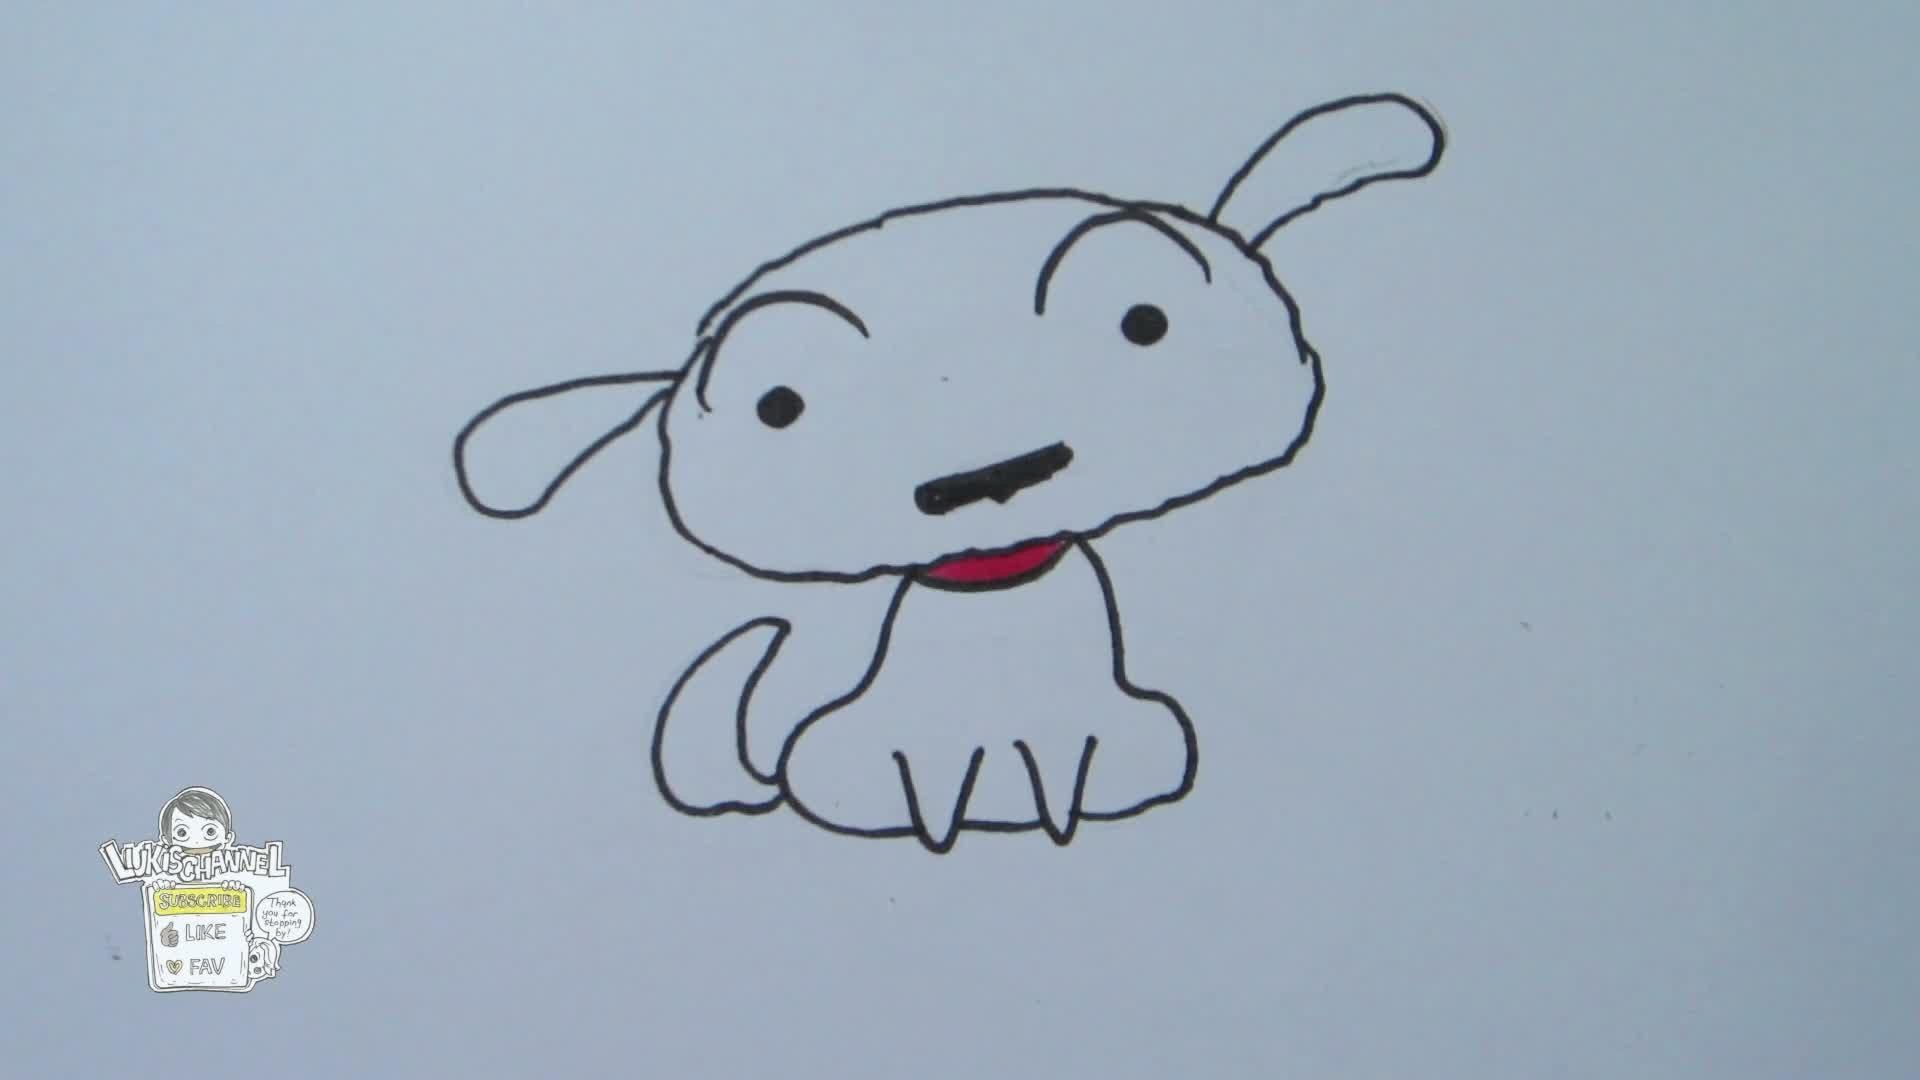 Shin Drawing At Getdrawings Com Free For Personal Use Shin Drawing